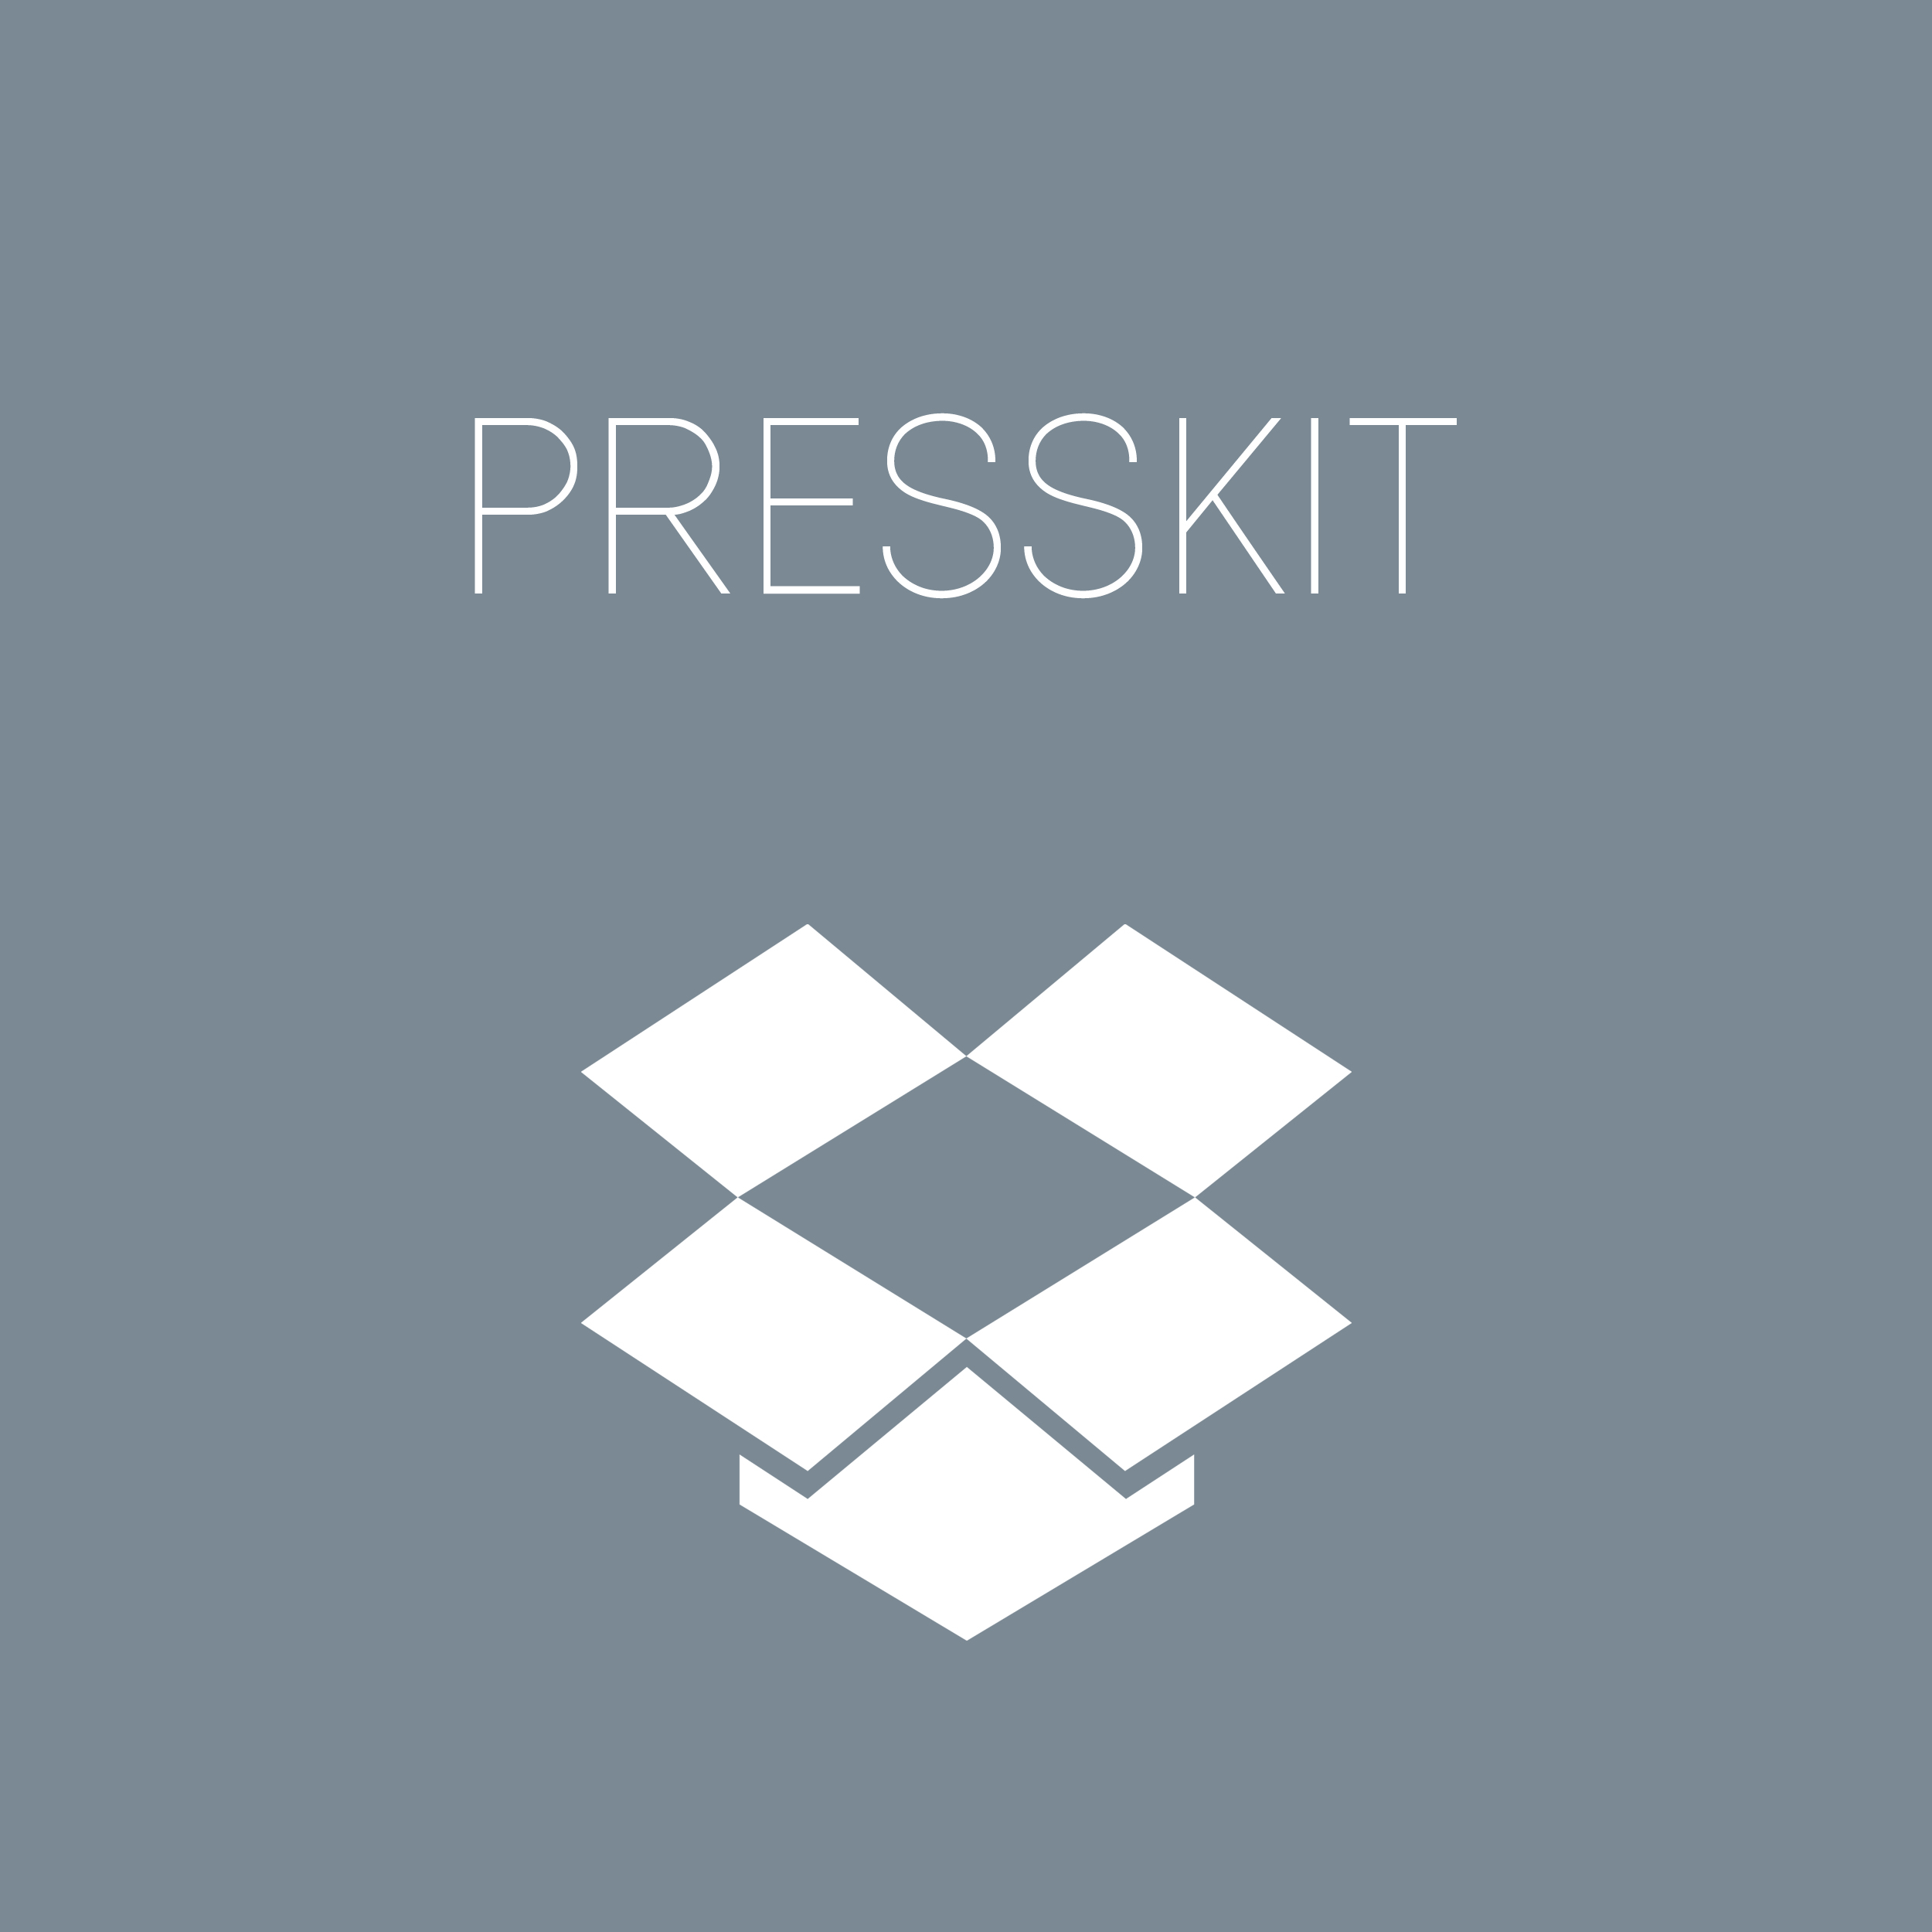 Presskit and Information